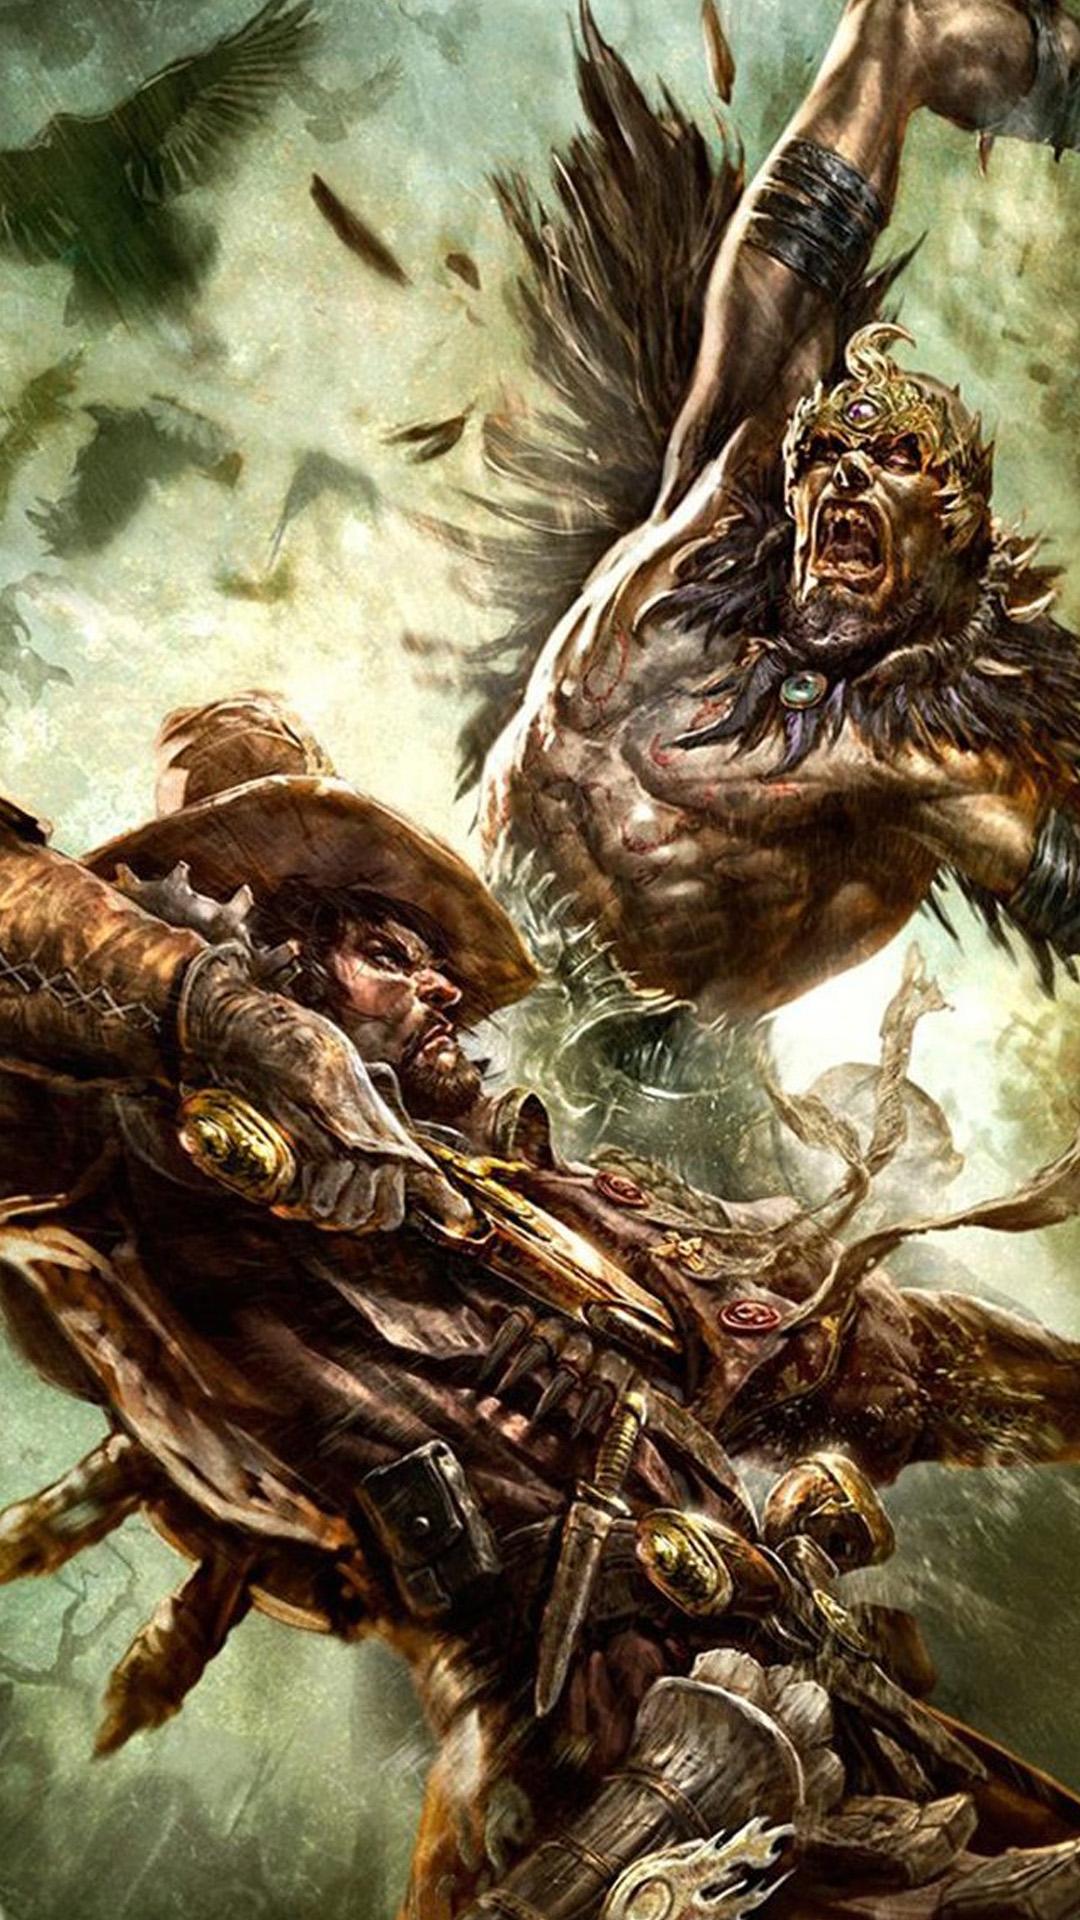 Warhammer Online Android Wallpaper - Warhammer Online , HD Wallpaper & Backgrounds